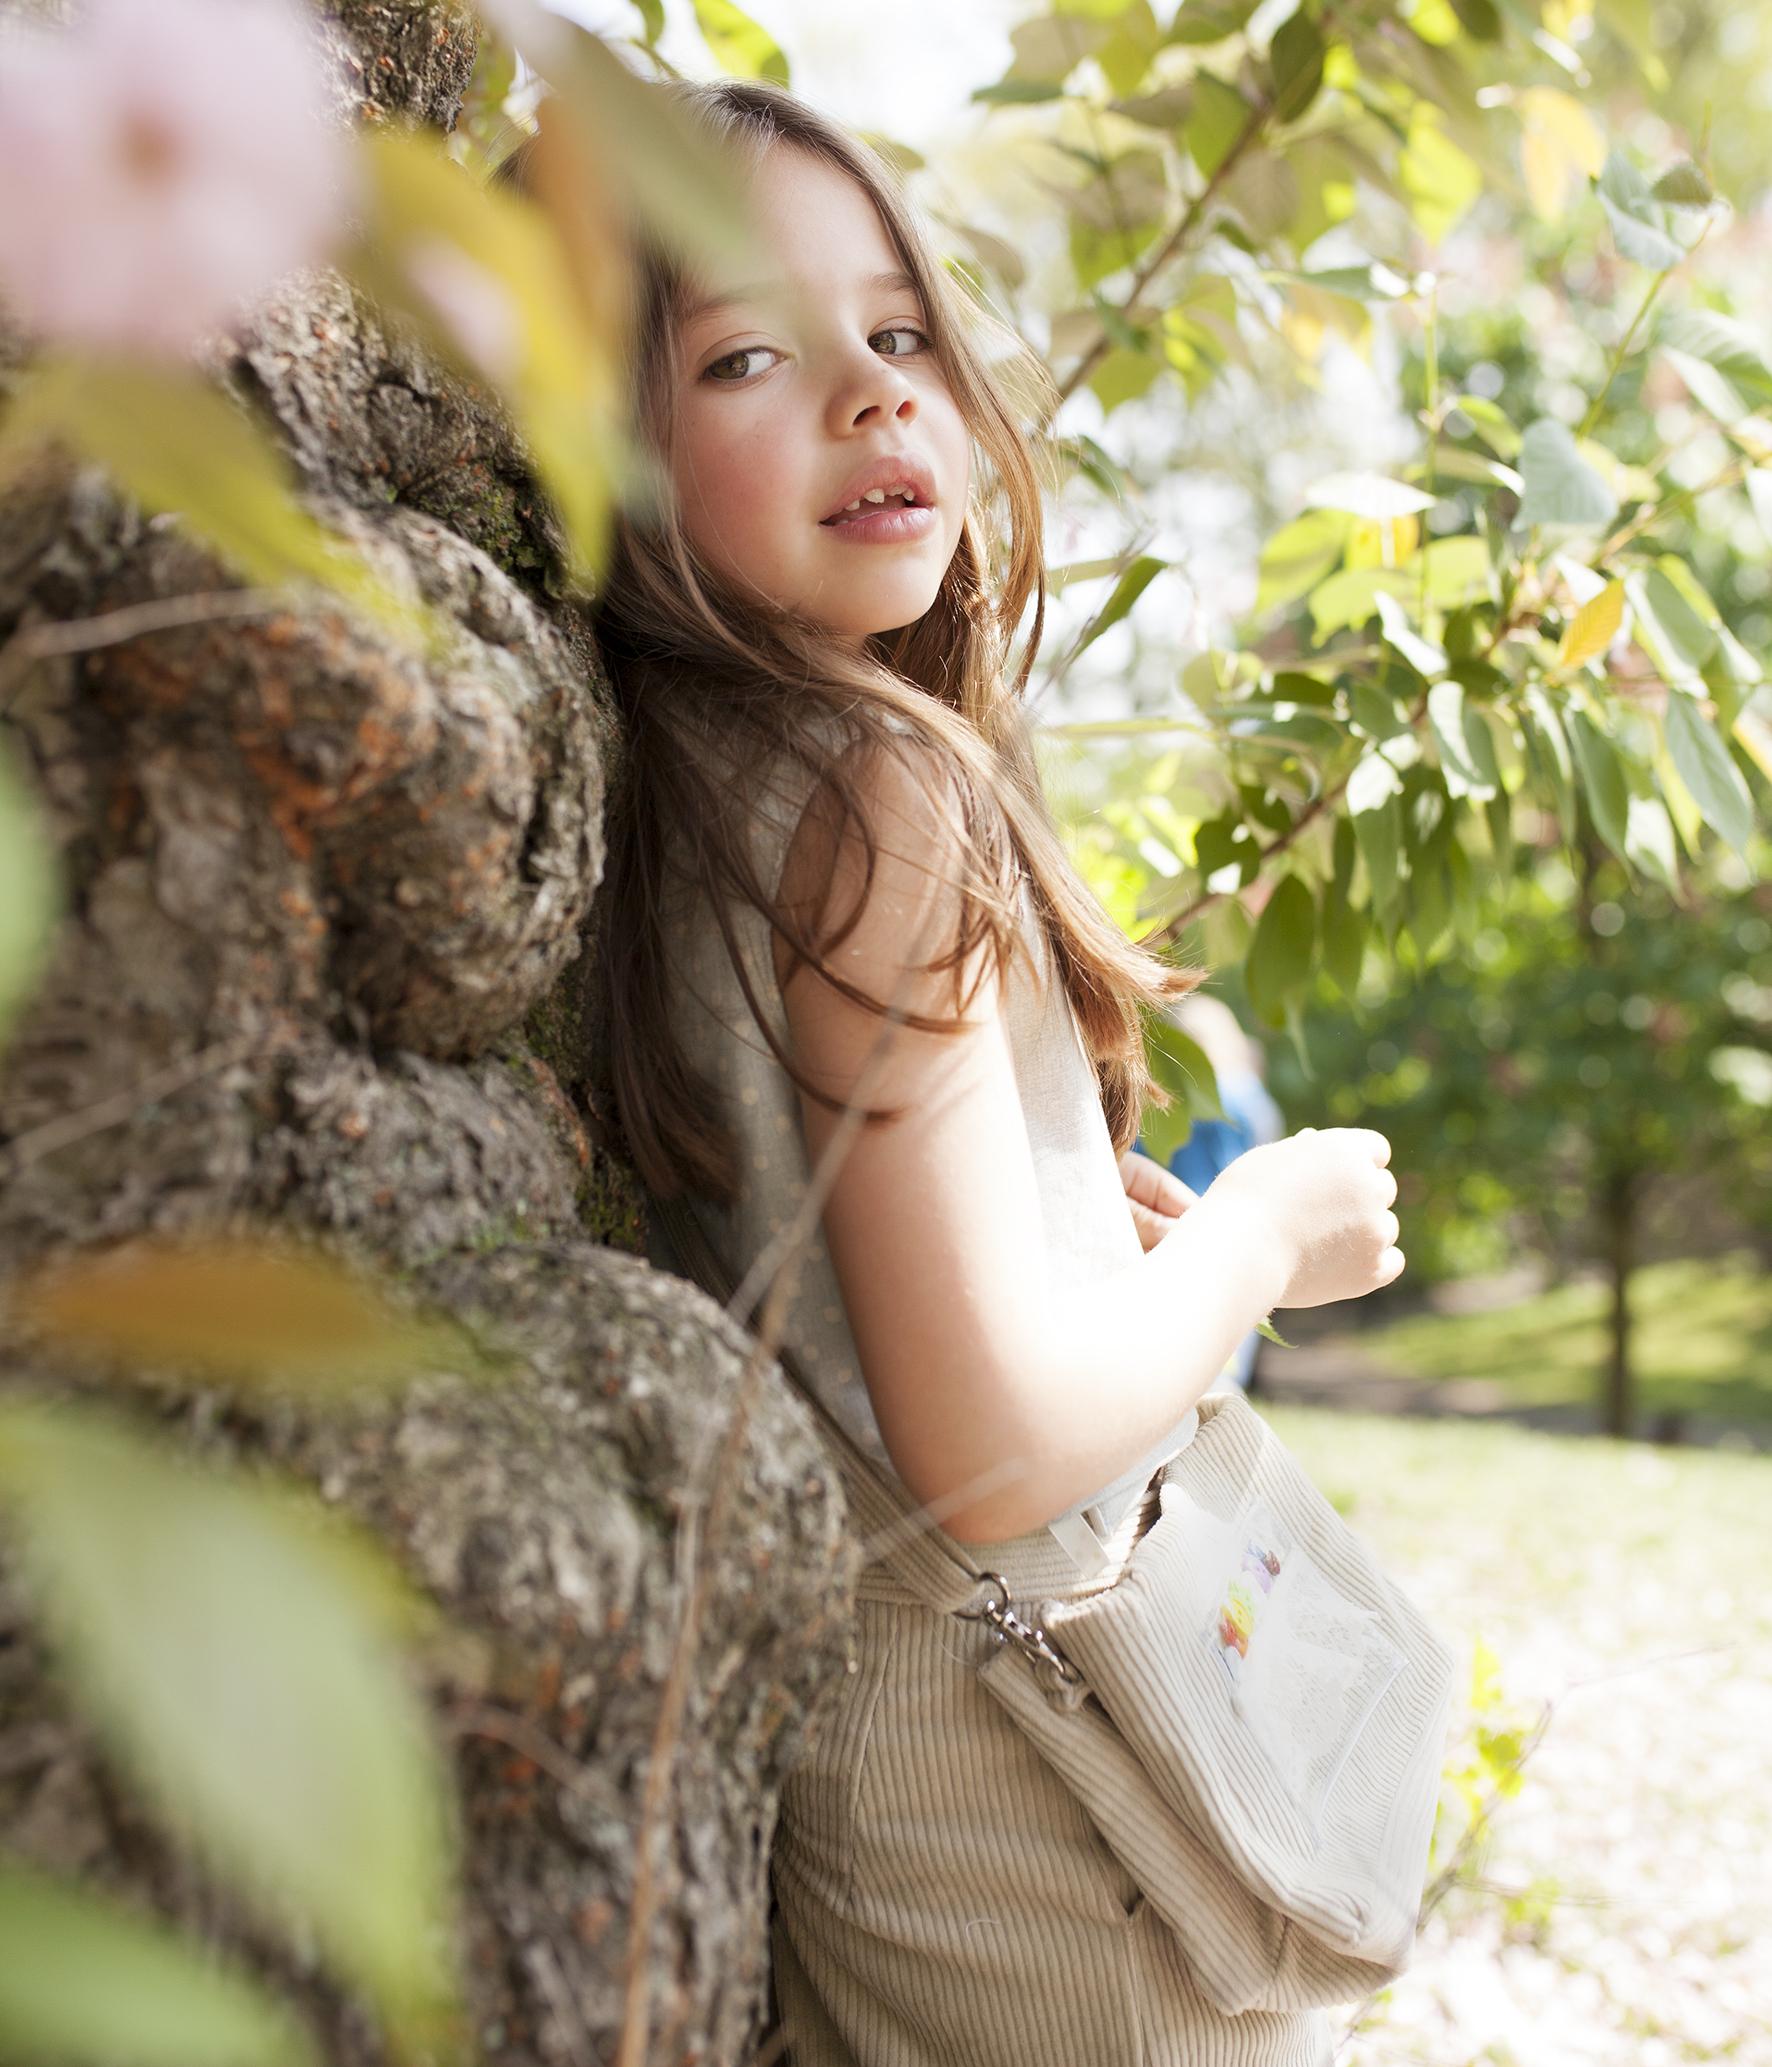 Layla_MG_9508.jpg